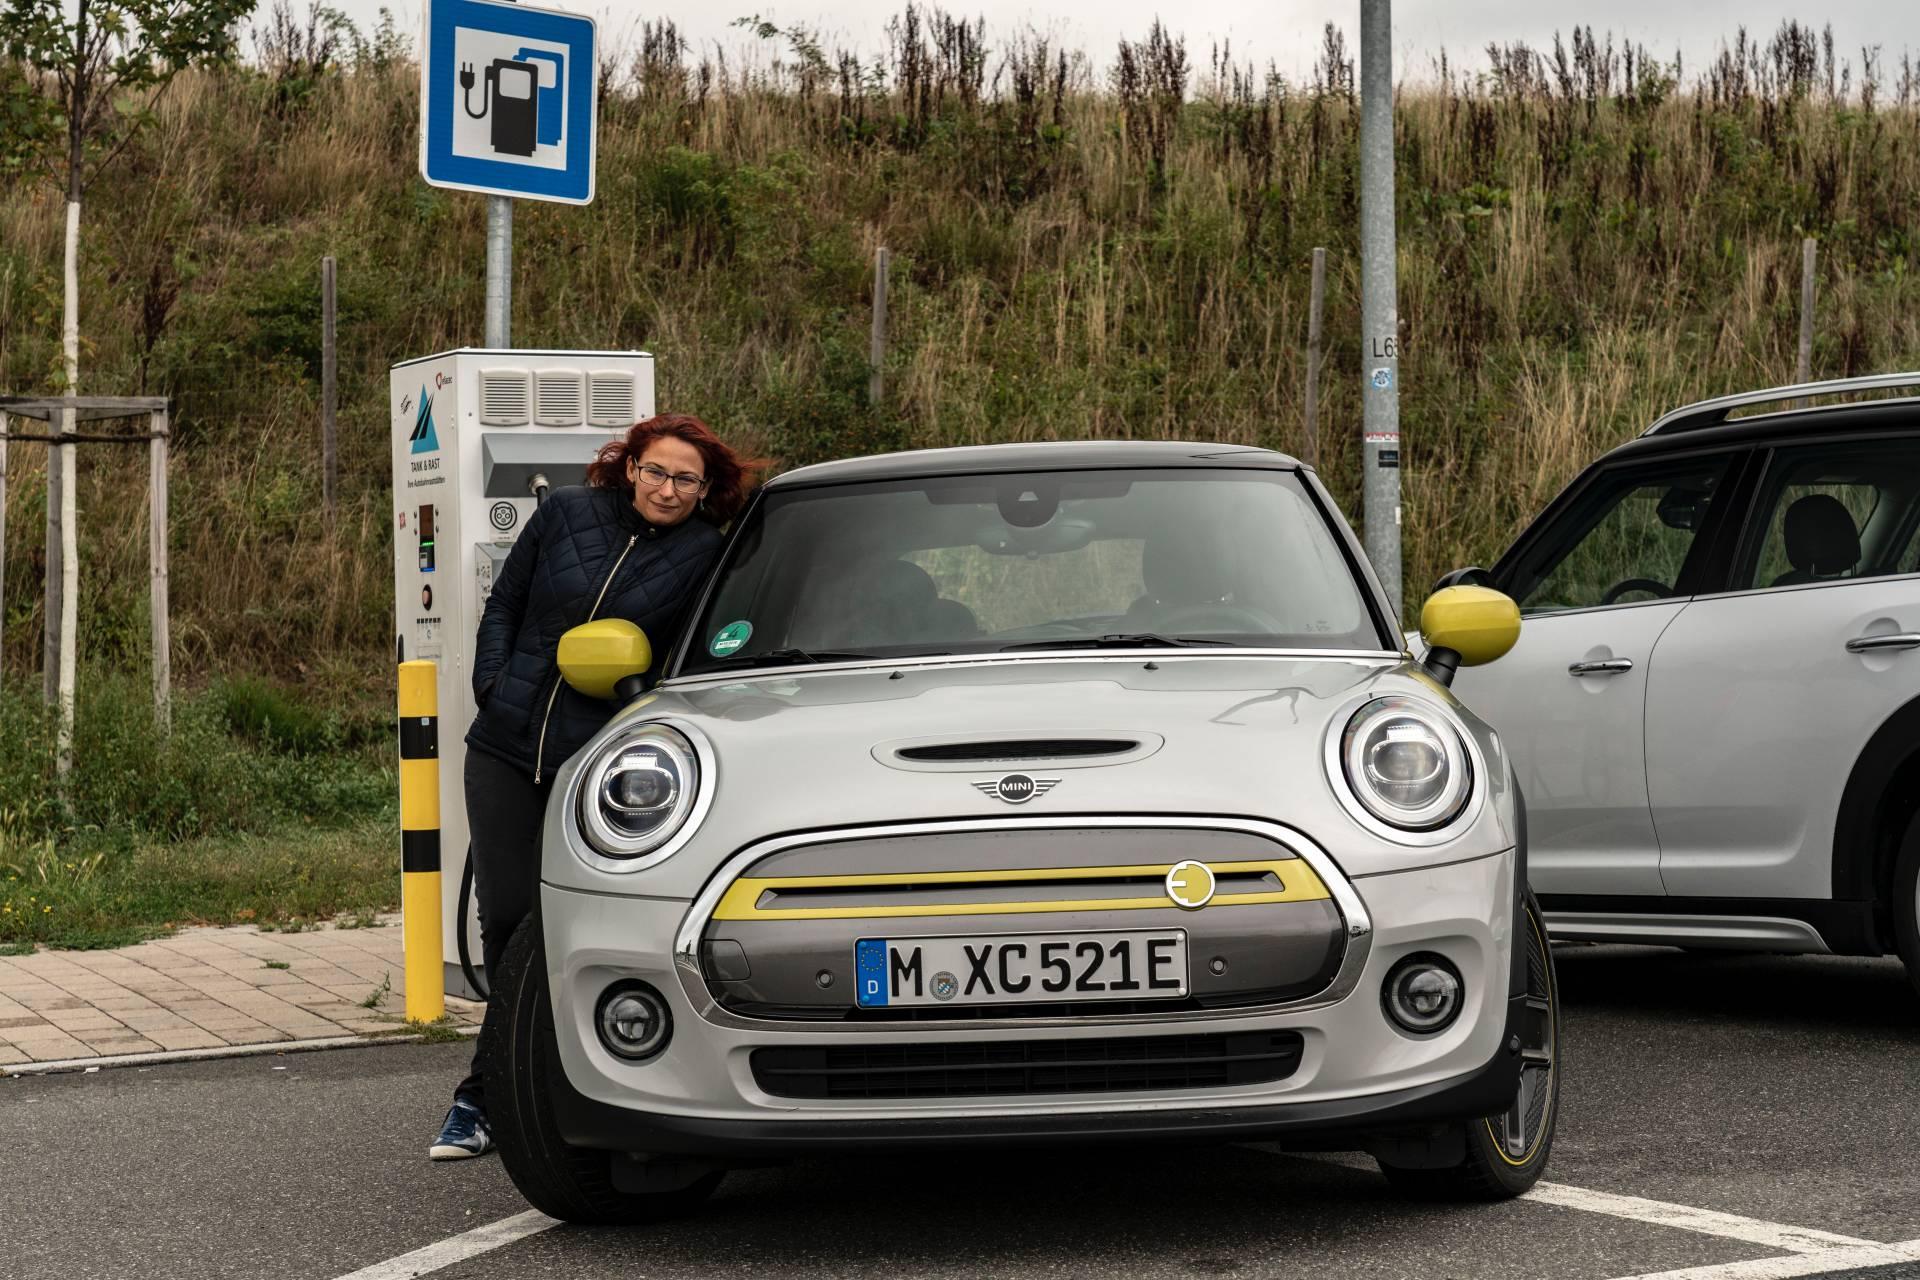 dc9ae539-2020-mini-cooper-se-drive-from-munich-to-frankfurt-6